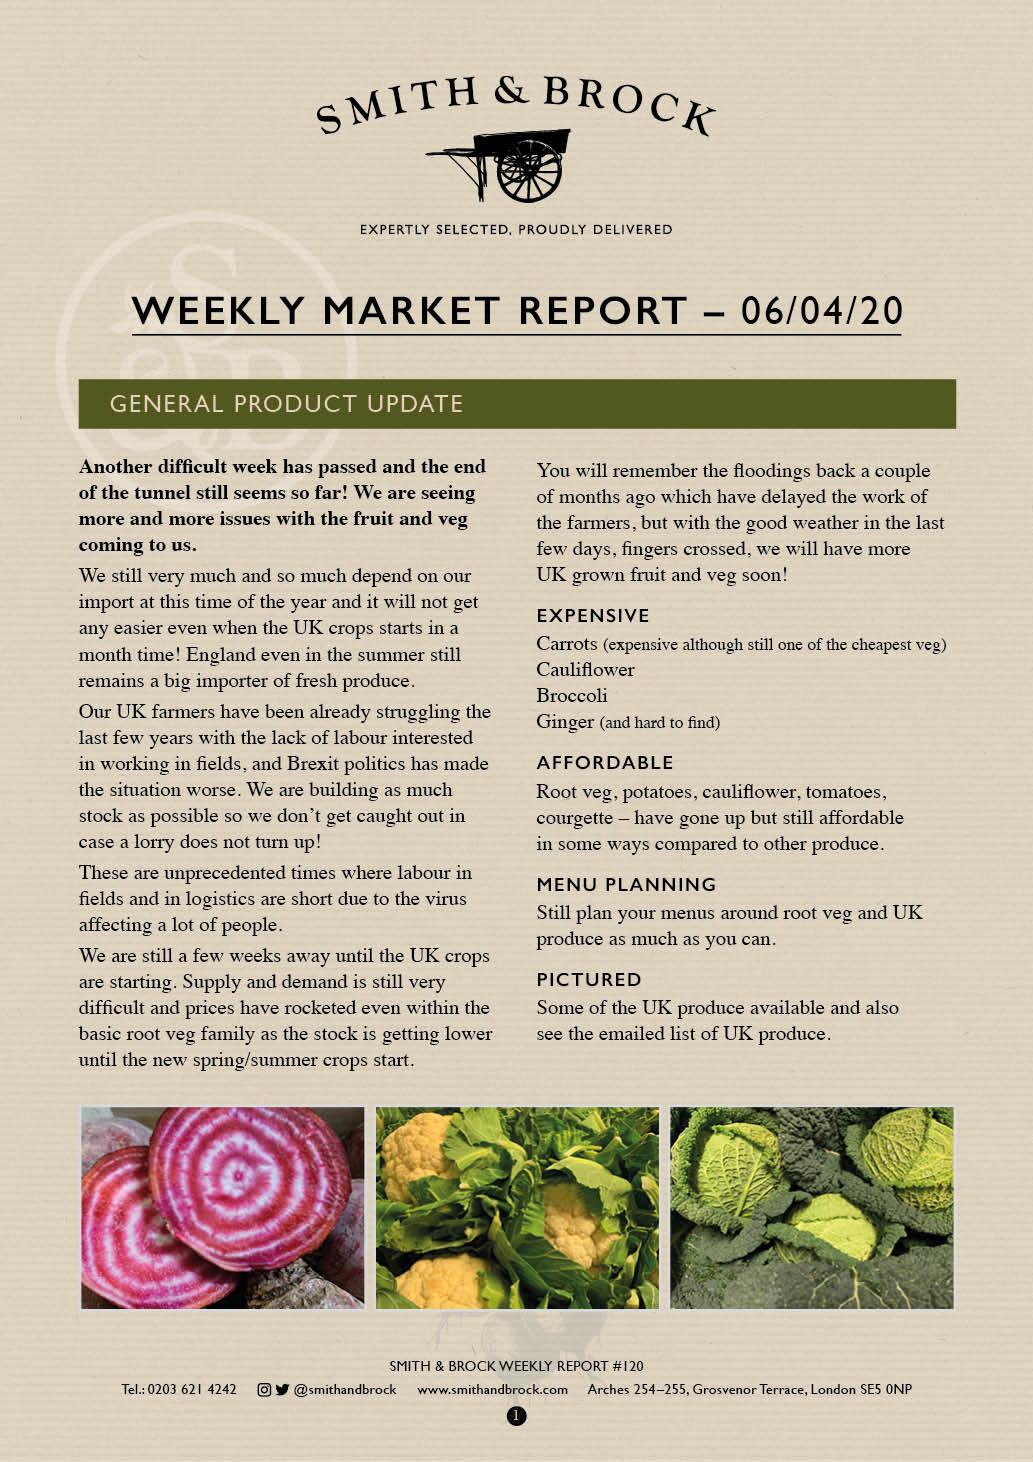 Smith&Brock Market Report 06 Apr 2020 120